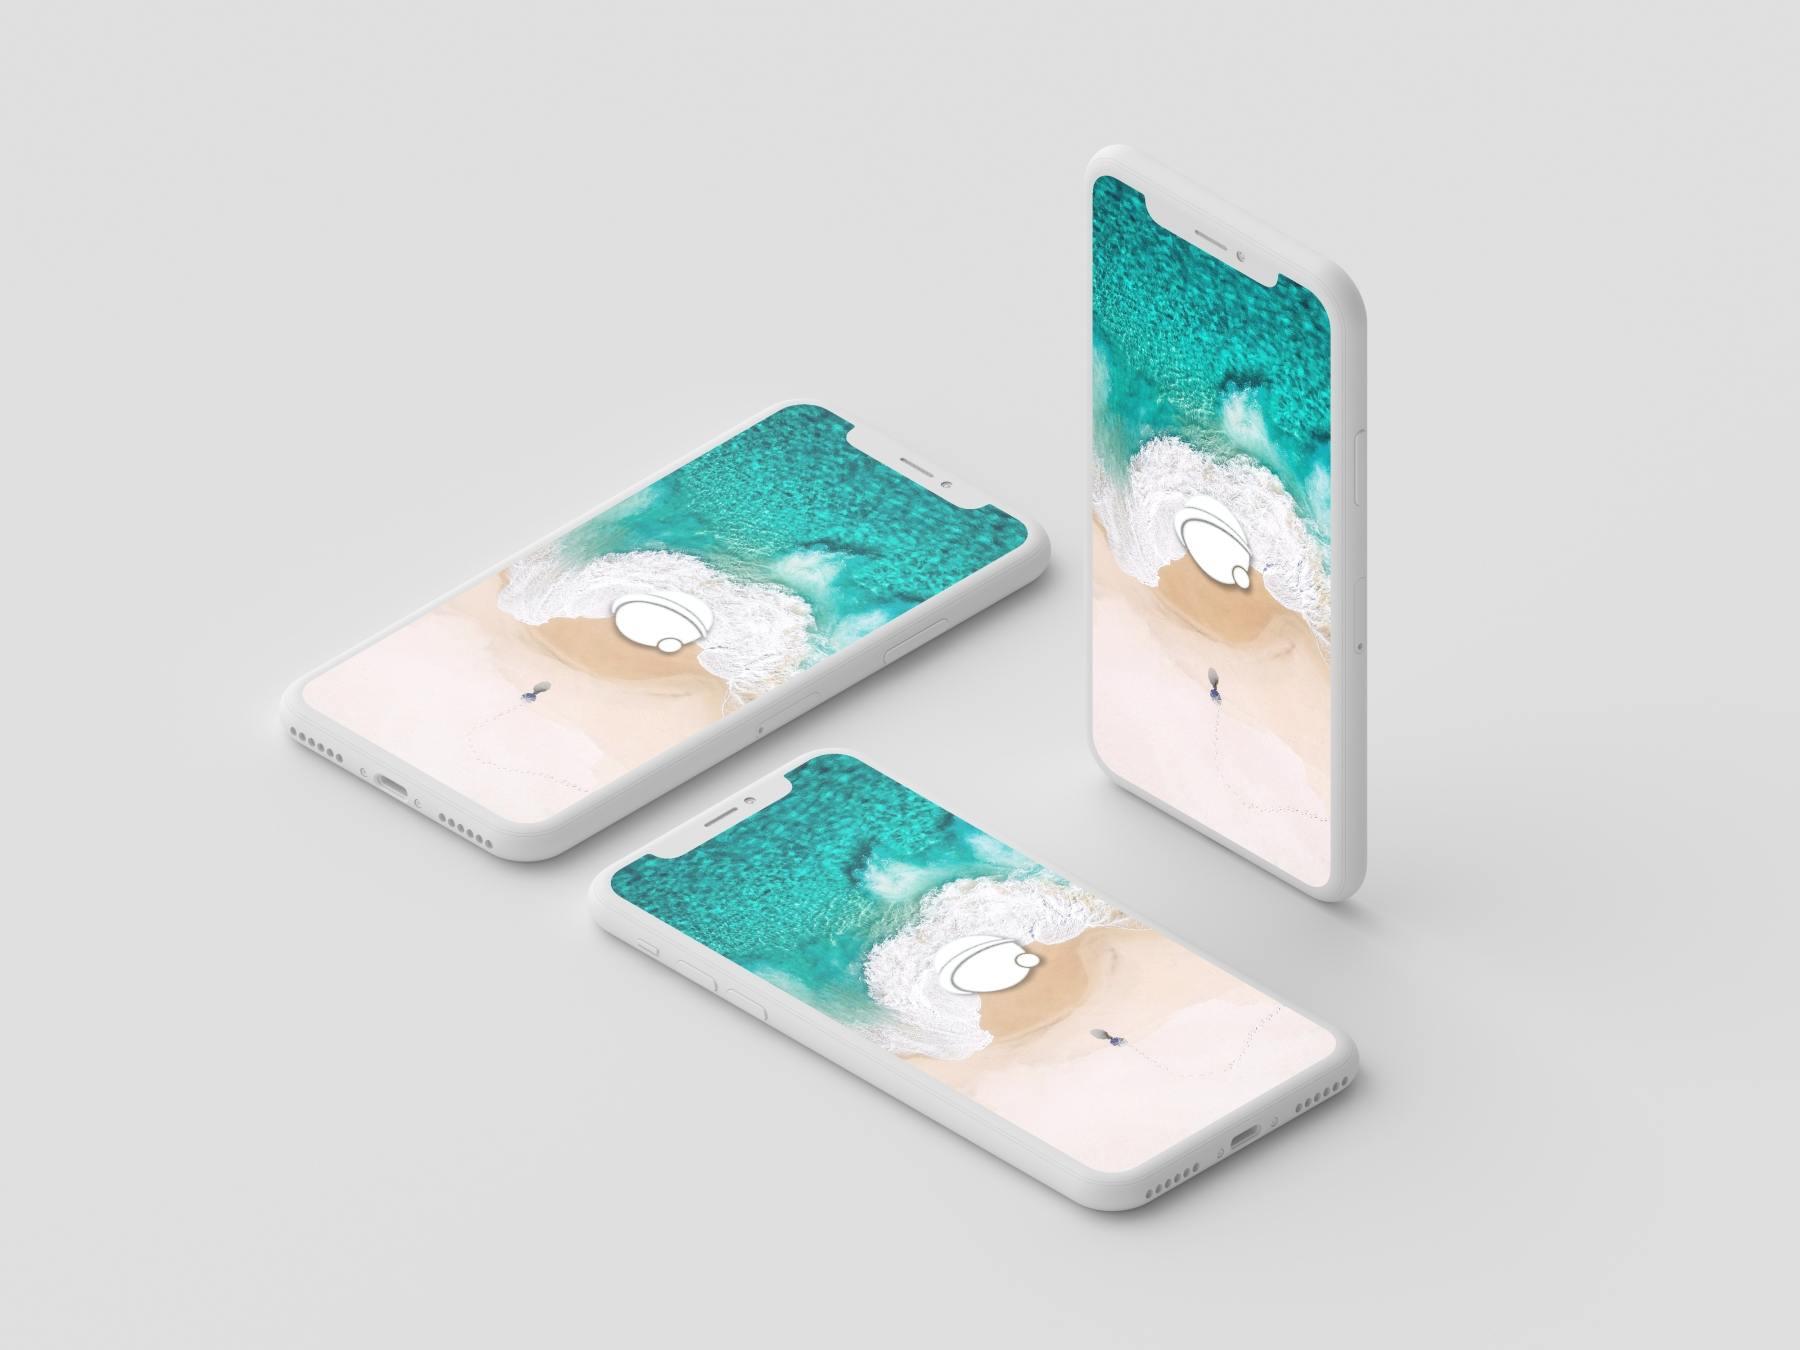 1569727121 c6b886191596479 - 苹果iPhoneX UI样机